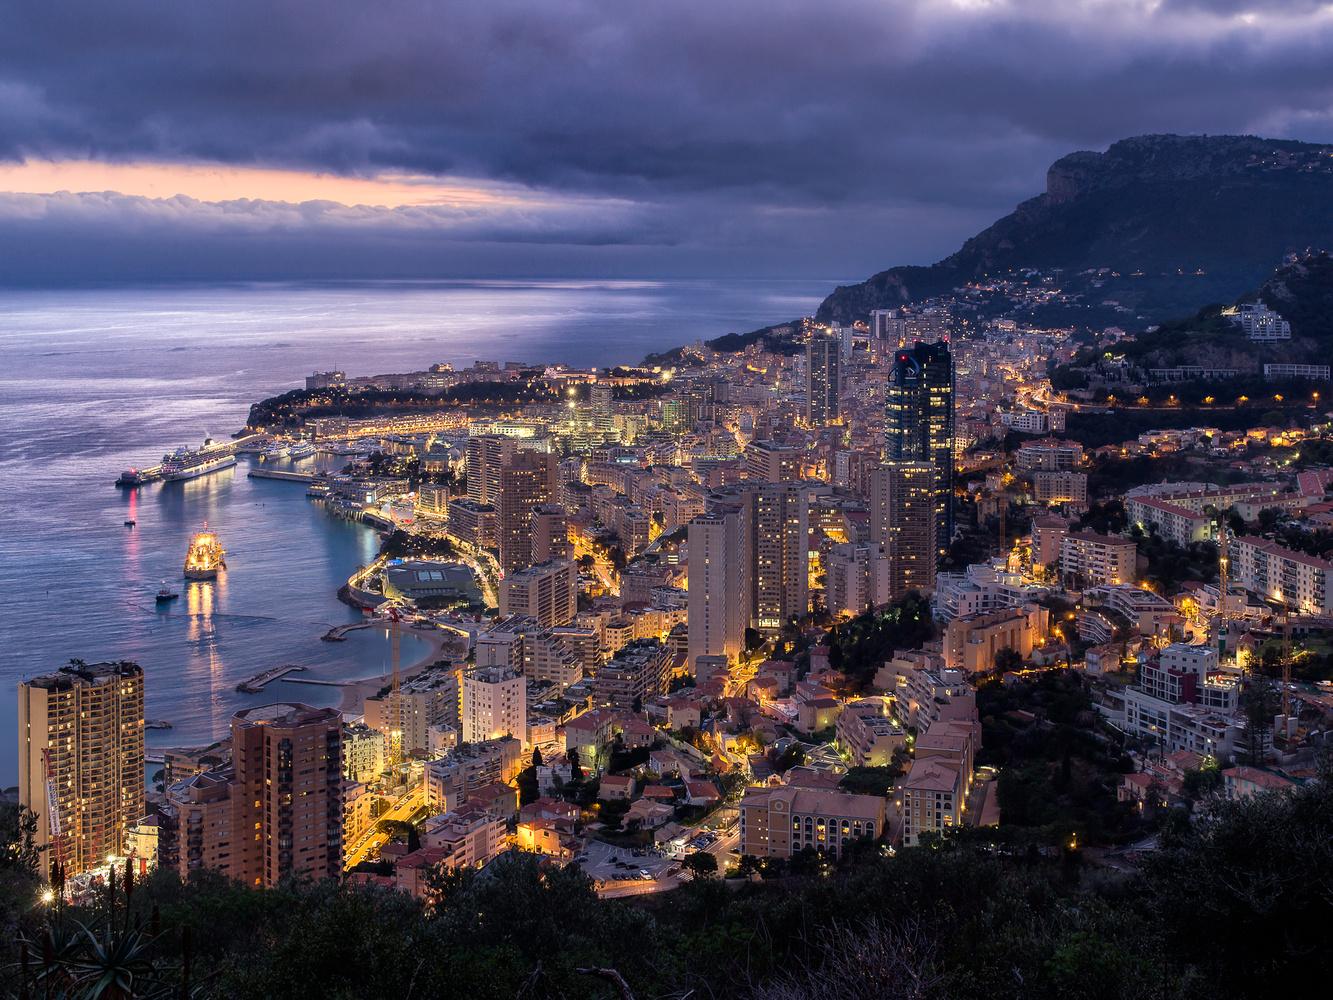 Monaco by Denis Degioanni